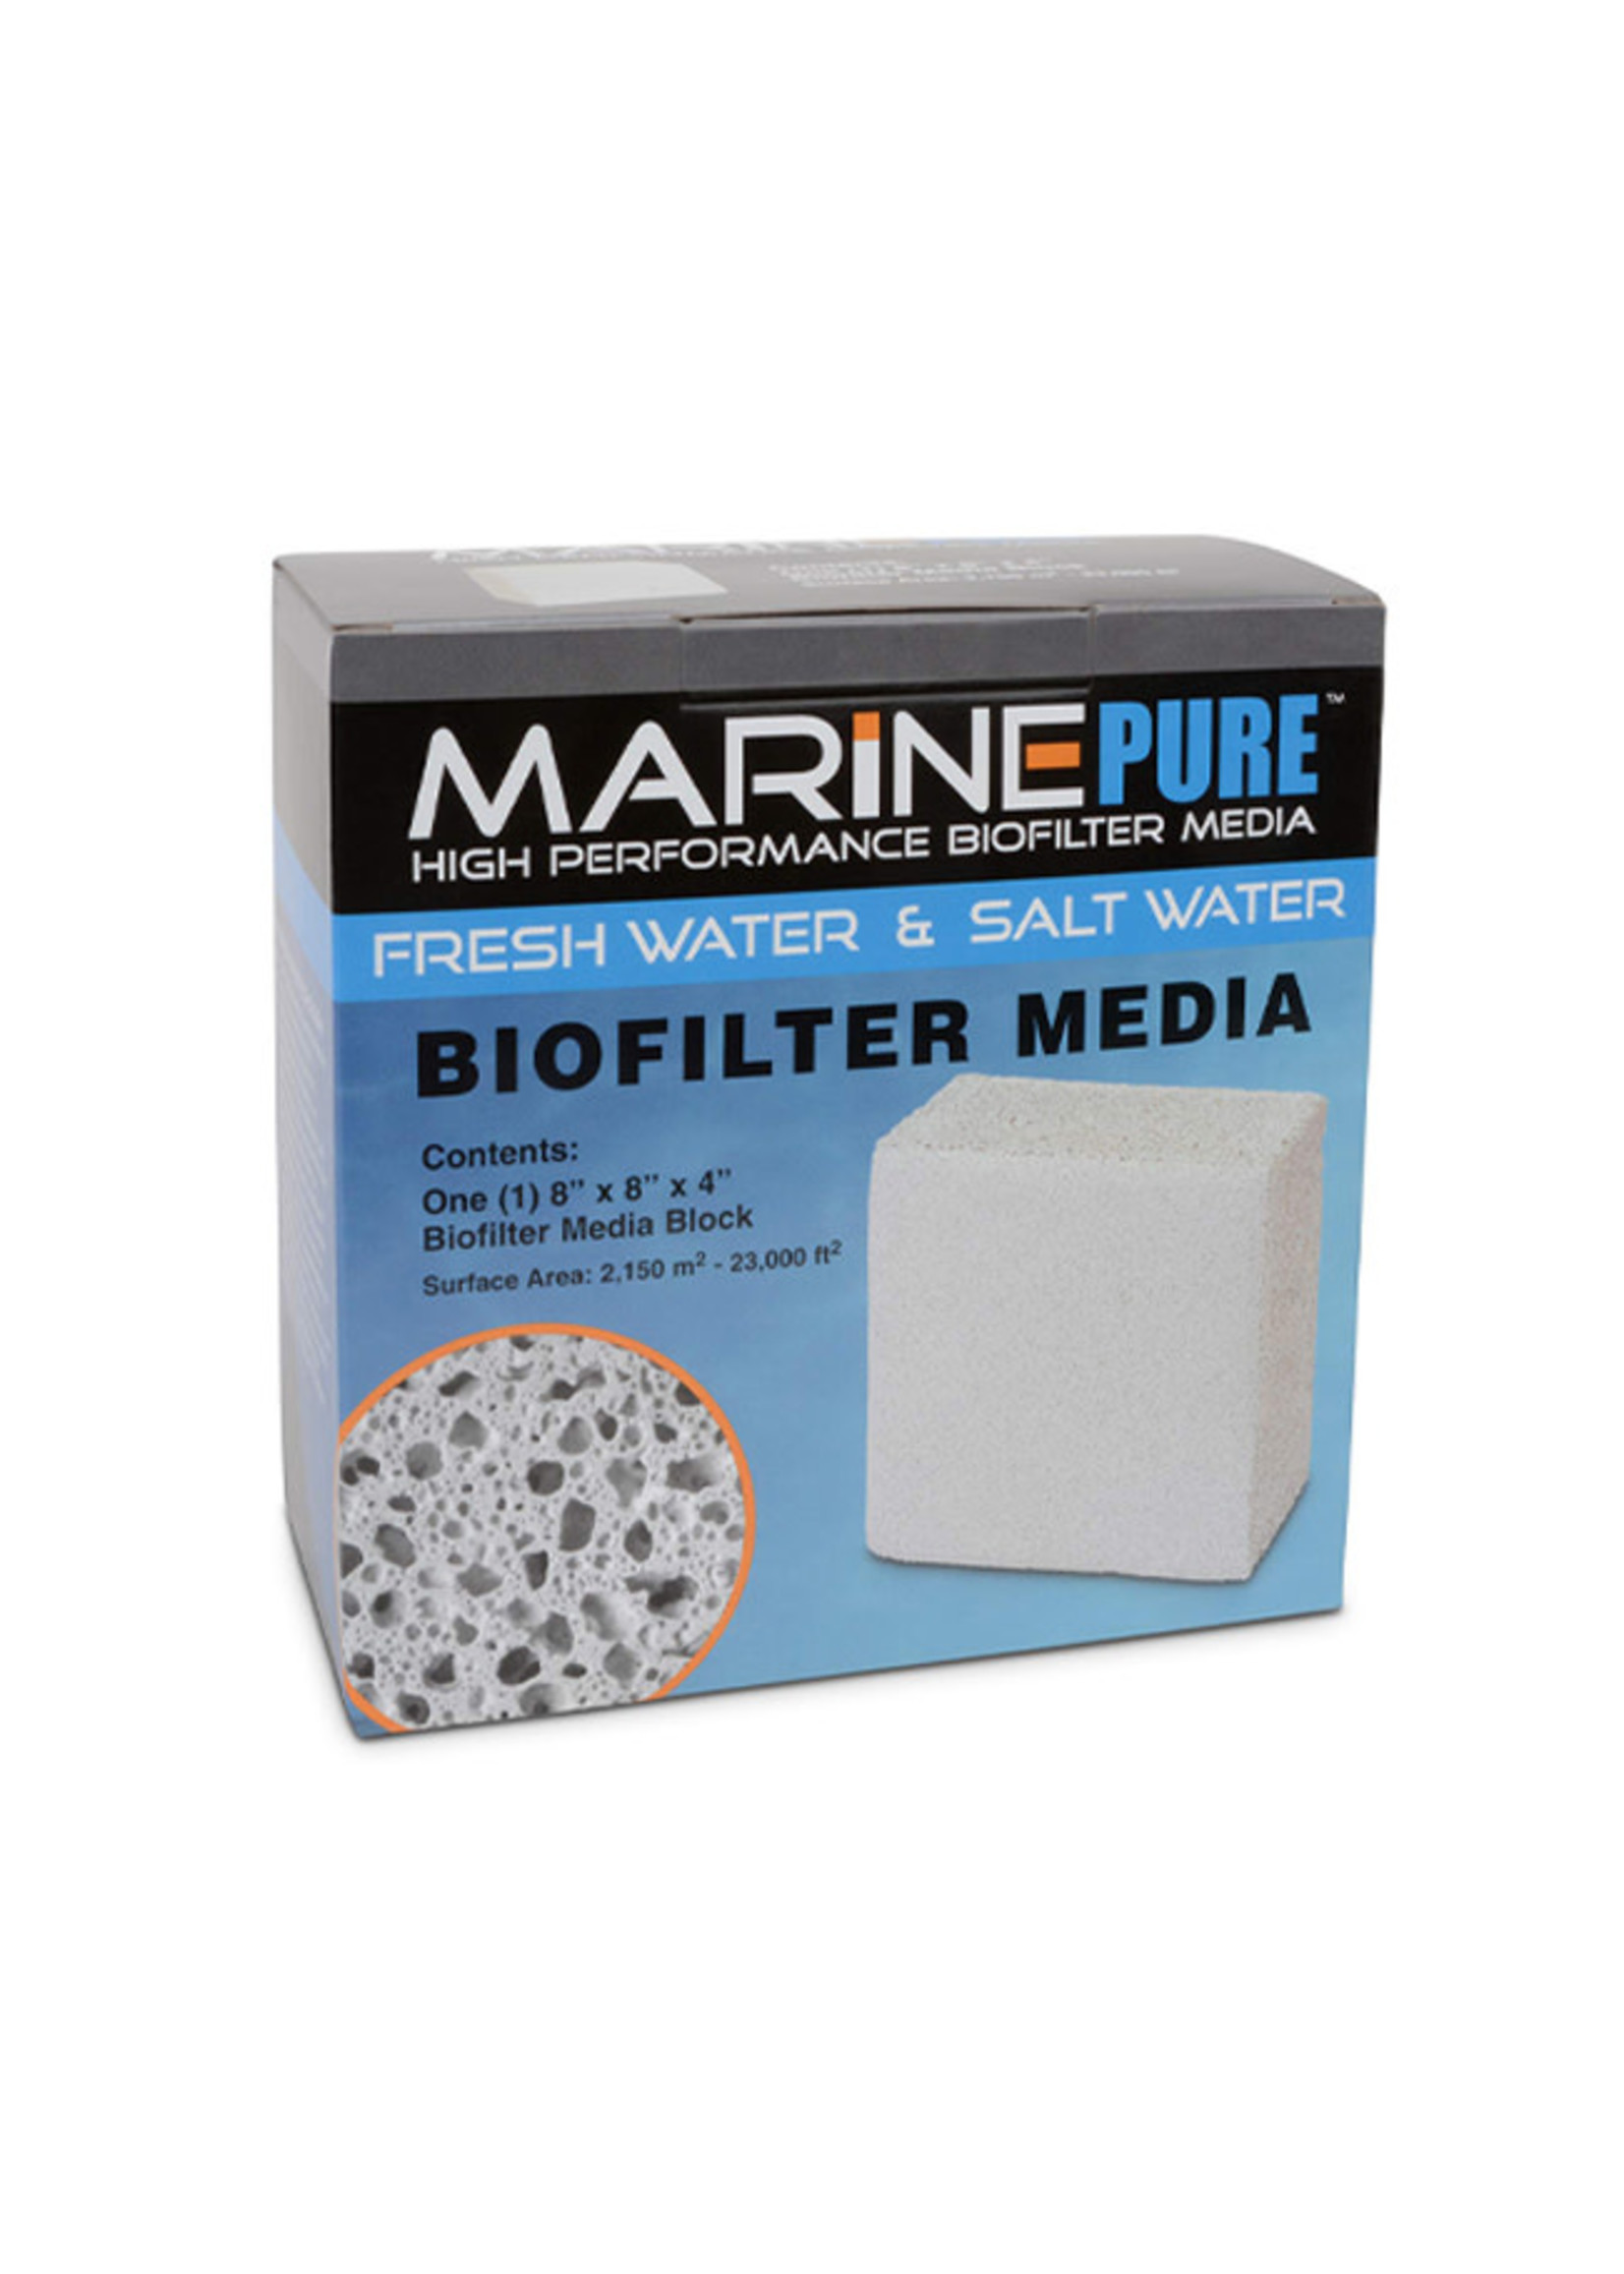 MarinePure MarinePure High Performance Biofilter Media Block